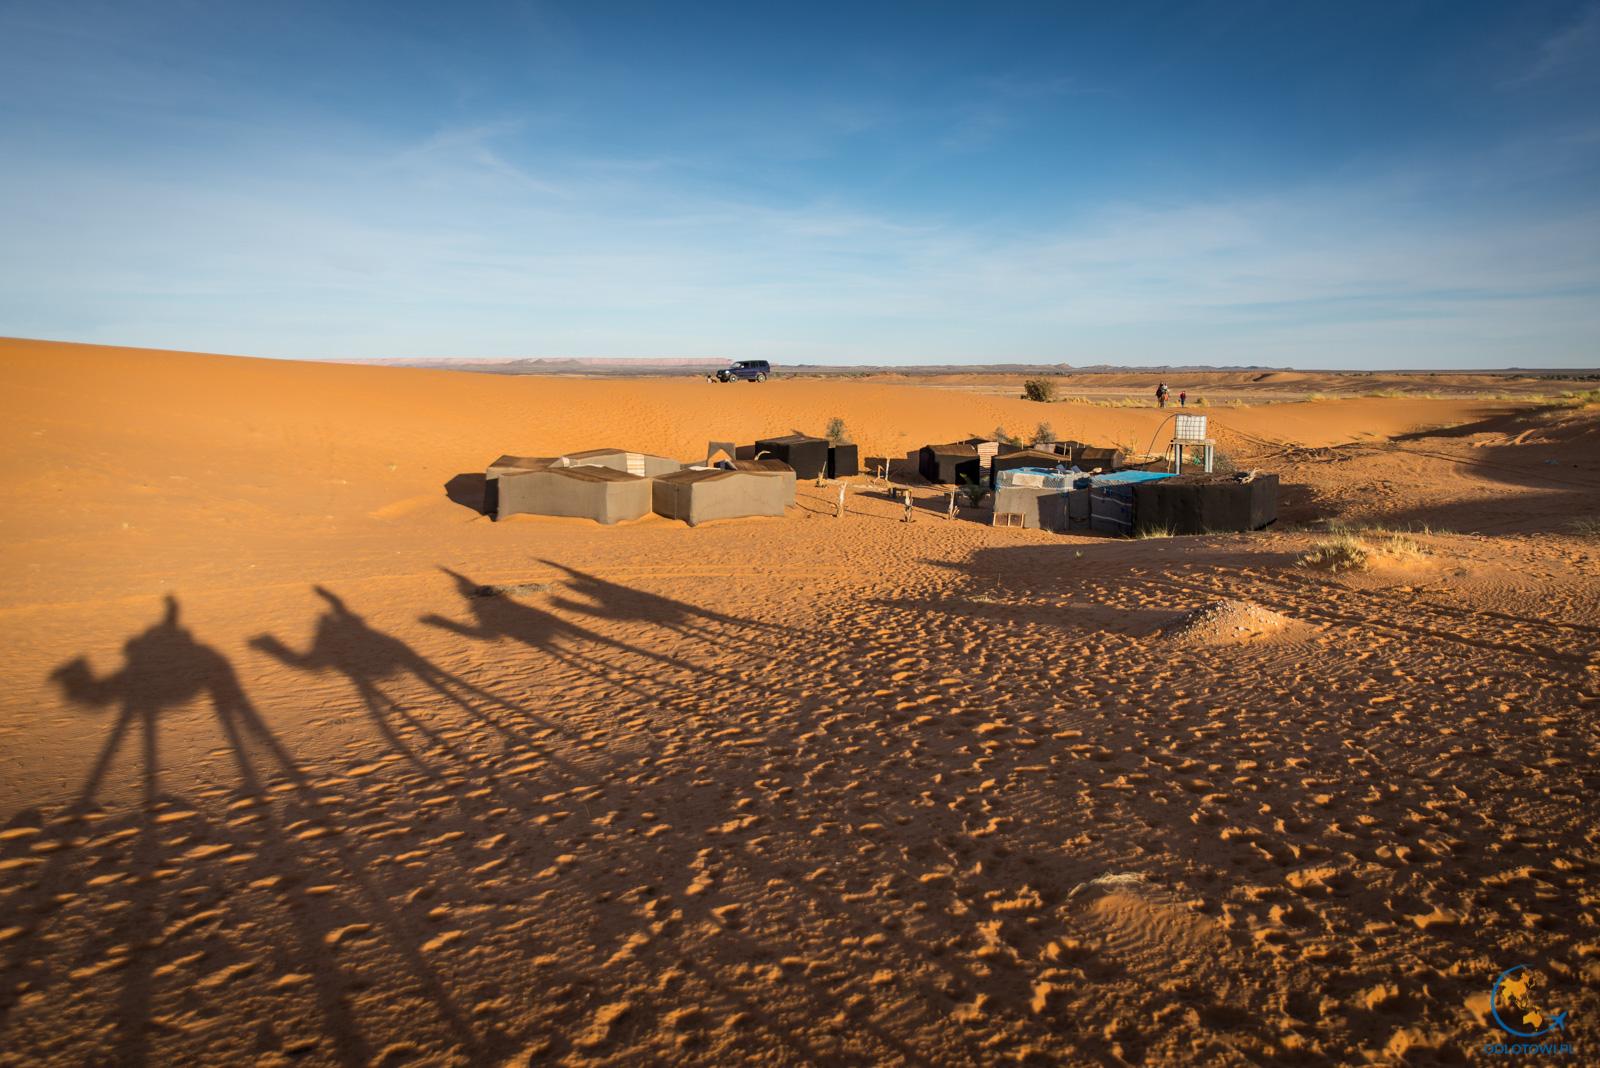 Obozowisko na pustyni, Sahara Maroko